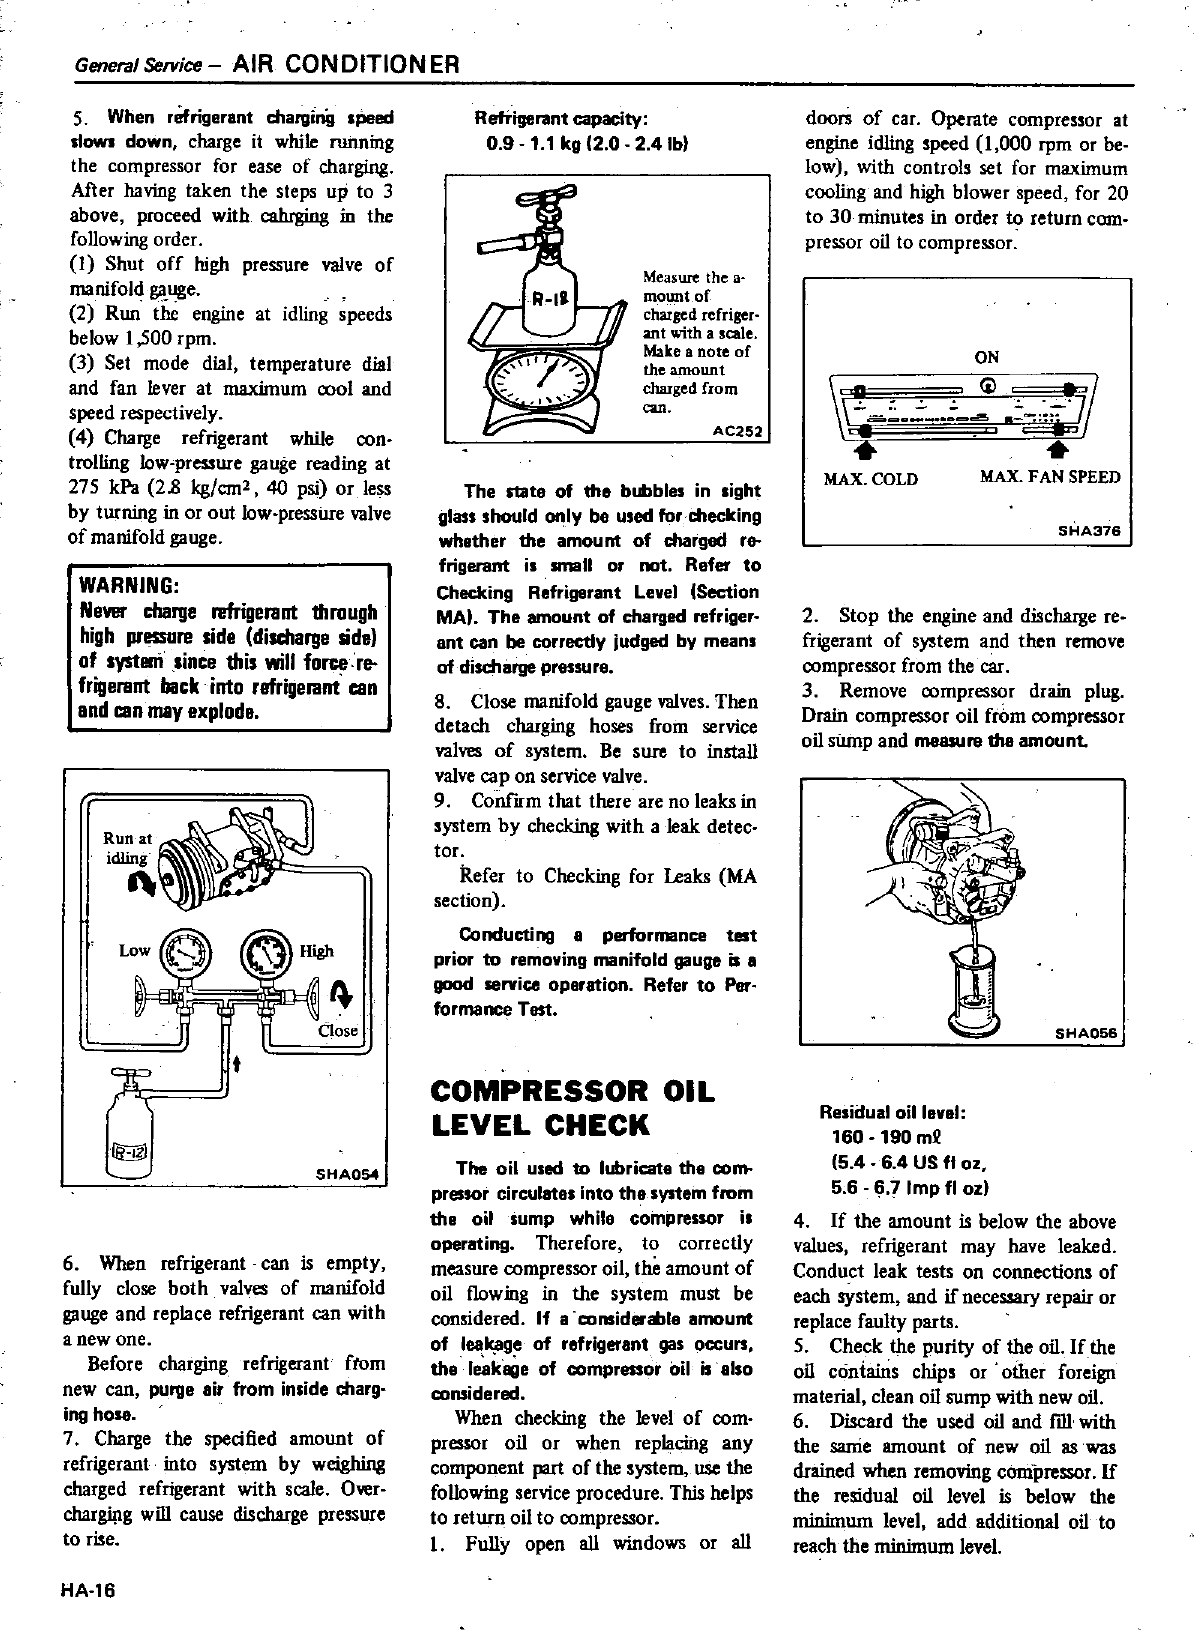 Nissan 1980 200Sx Repair Manual Service Datsun